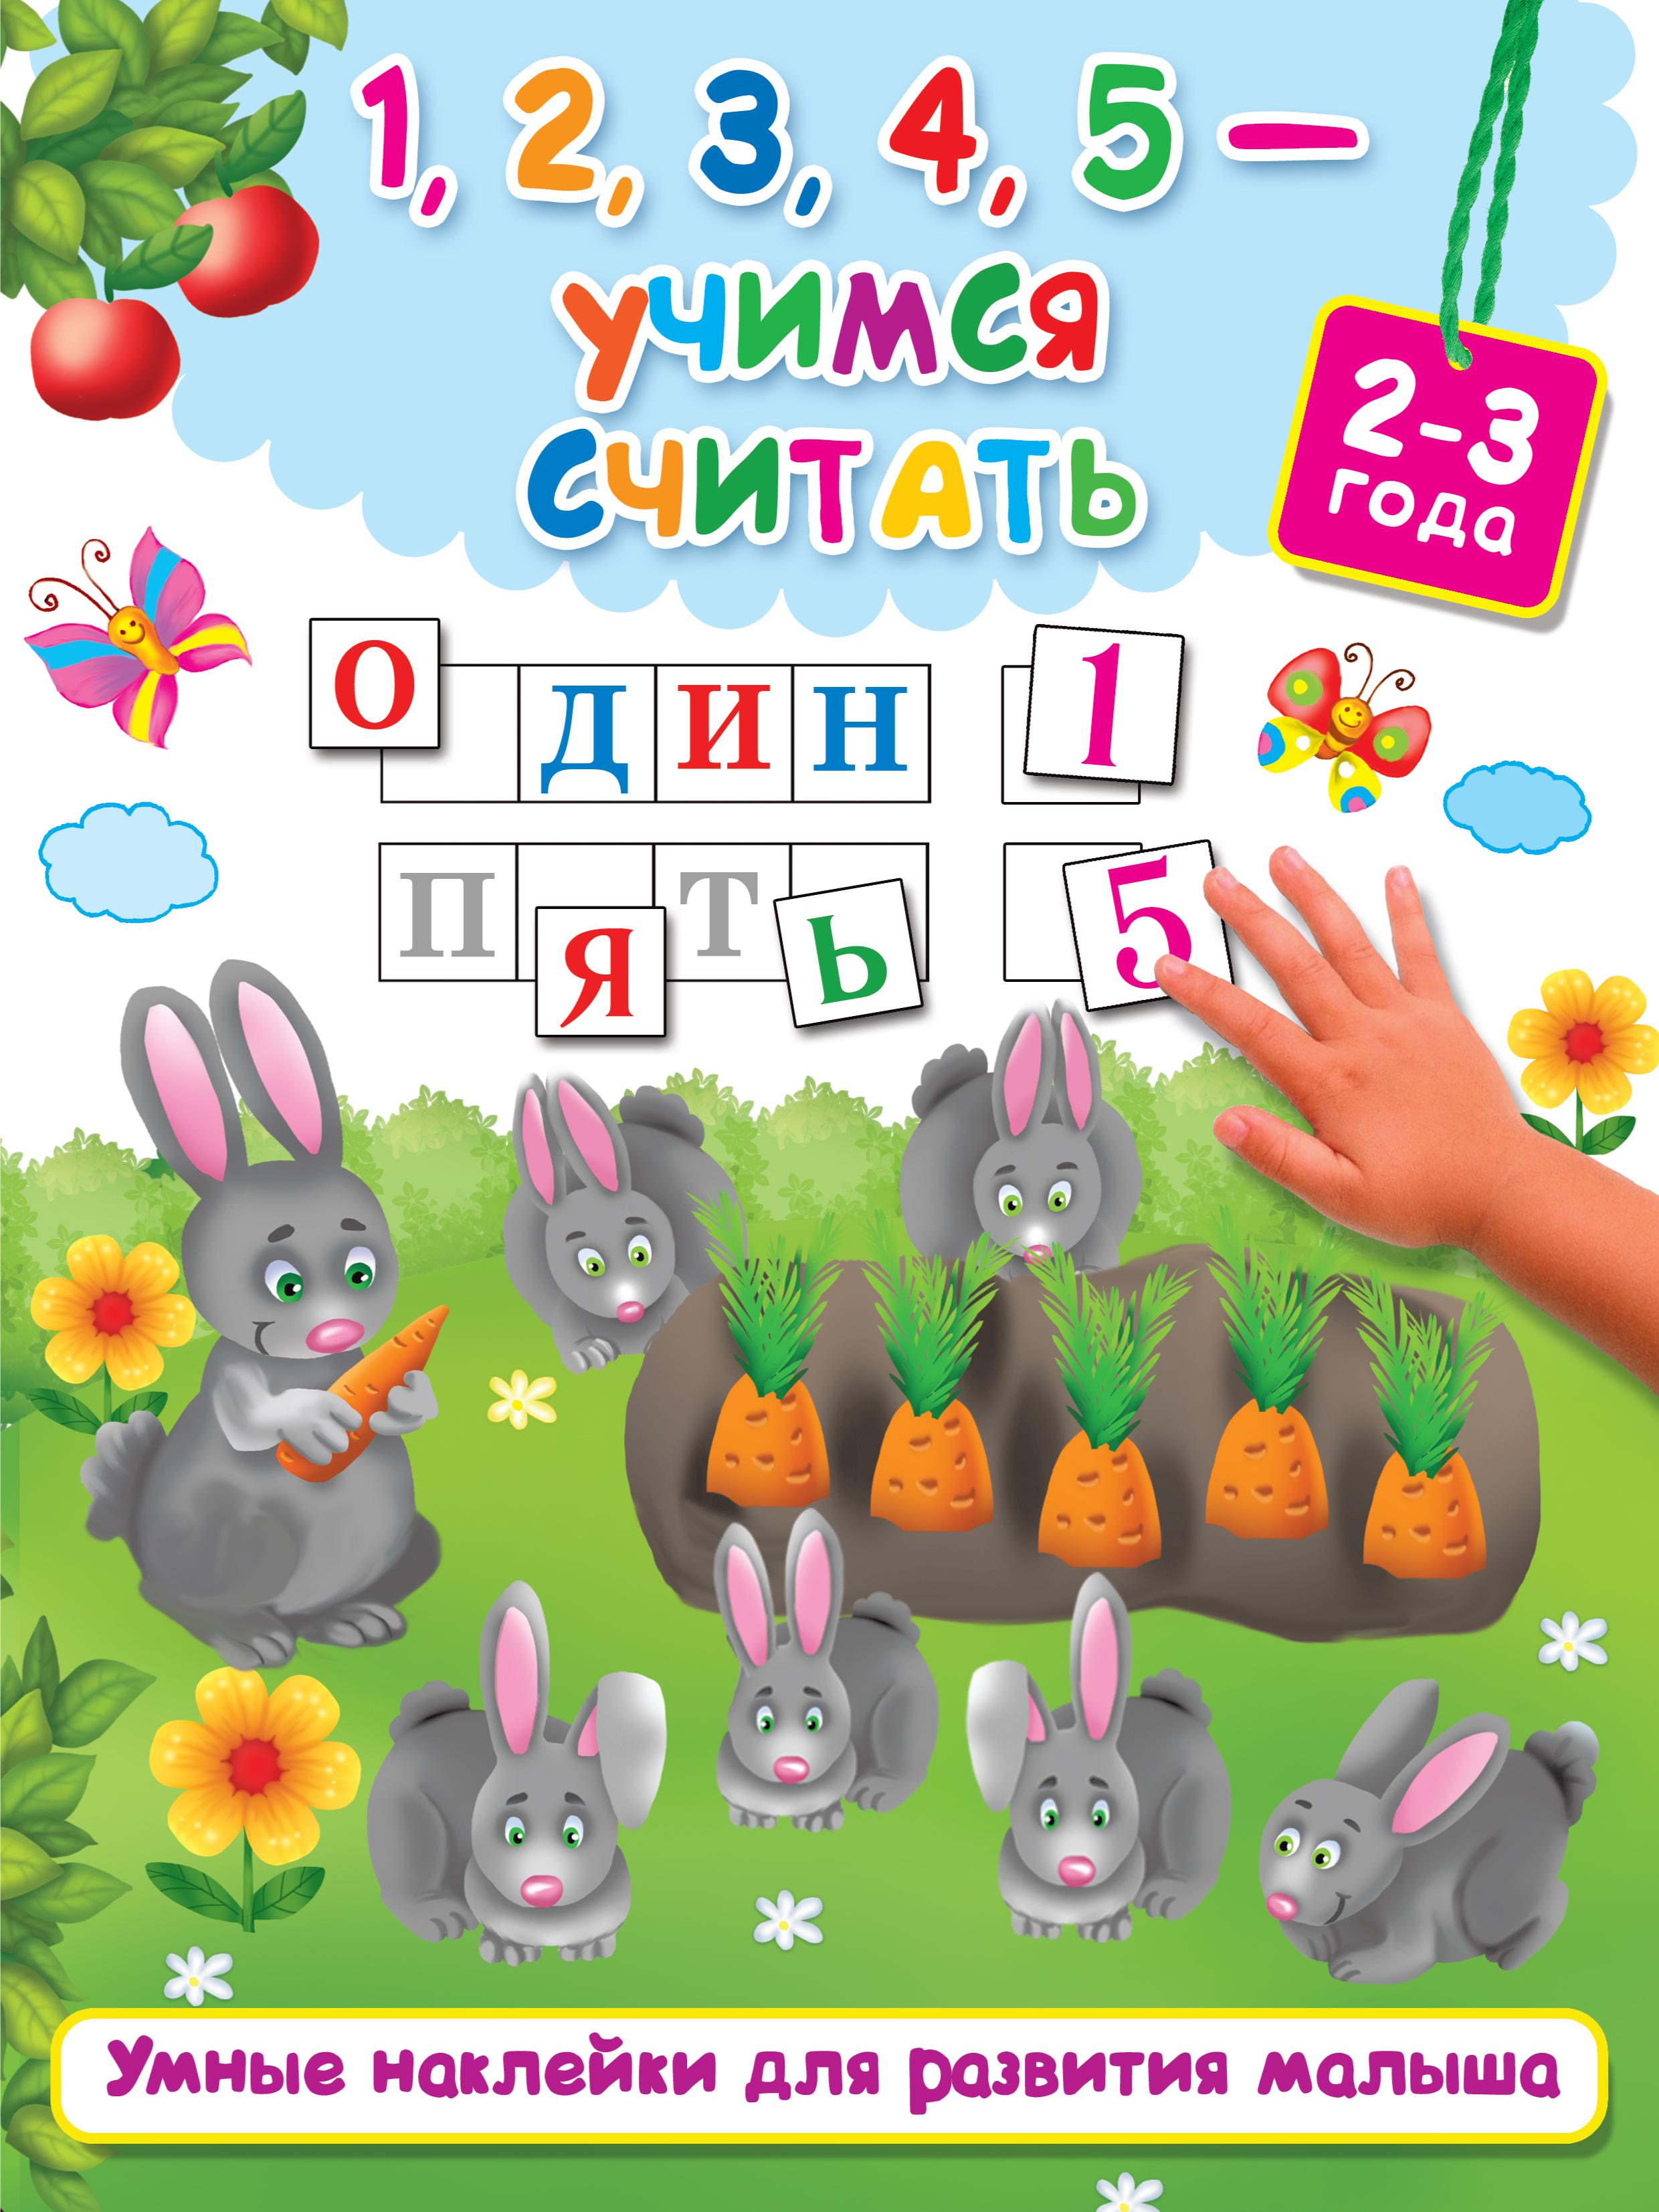 Дмитриева В.Г., Горбунова И.В. 1,2,3,4,5 - учимся считать раскраска книжка уроки математики учимся считать до 10 ф а4 8л 025838 8р403315